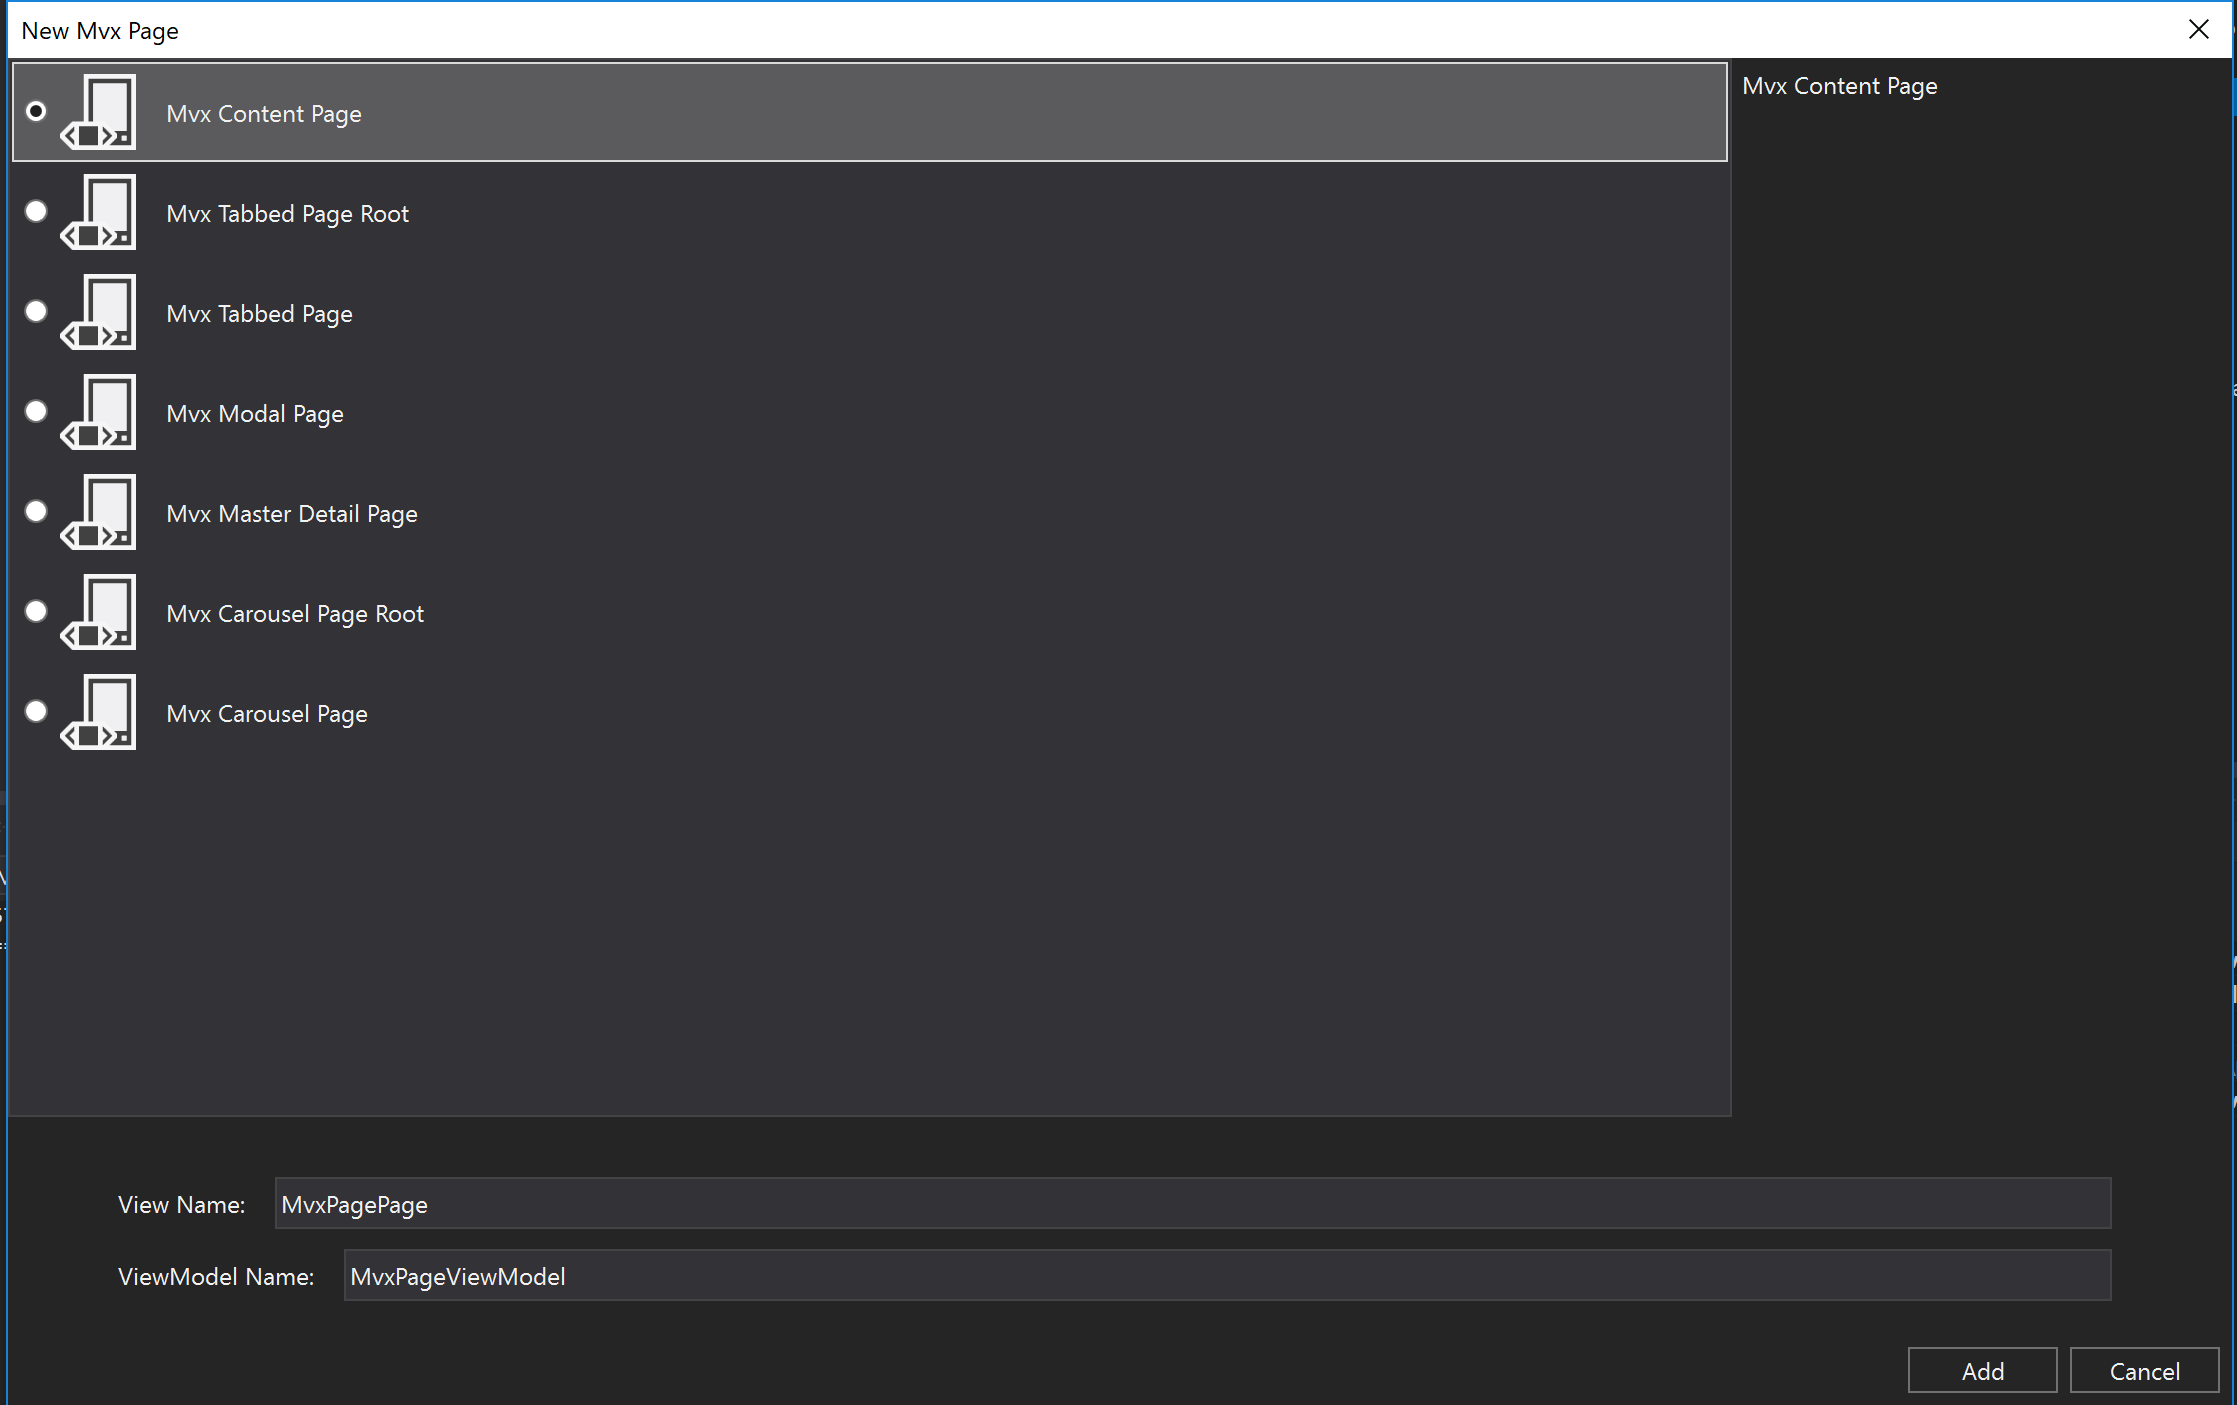 screenshot-newmvxpage-dialog.png